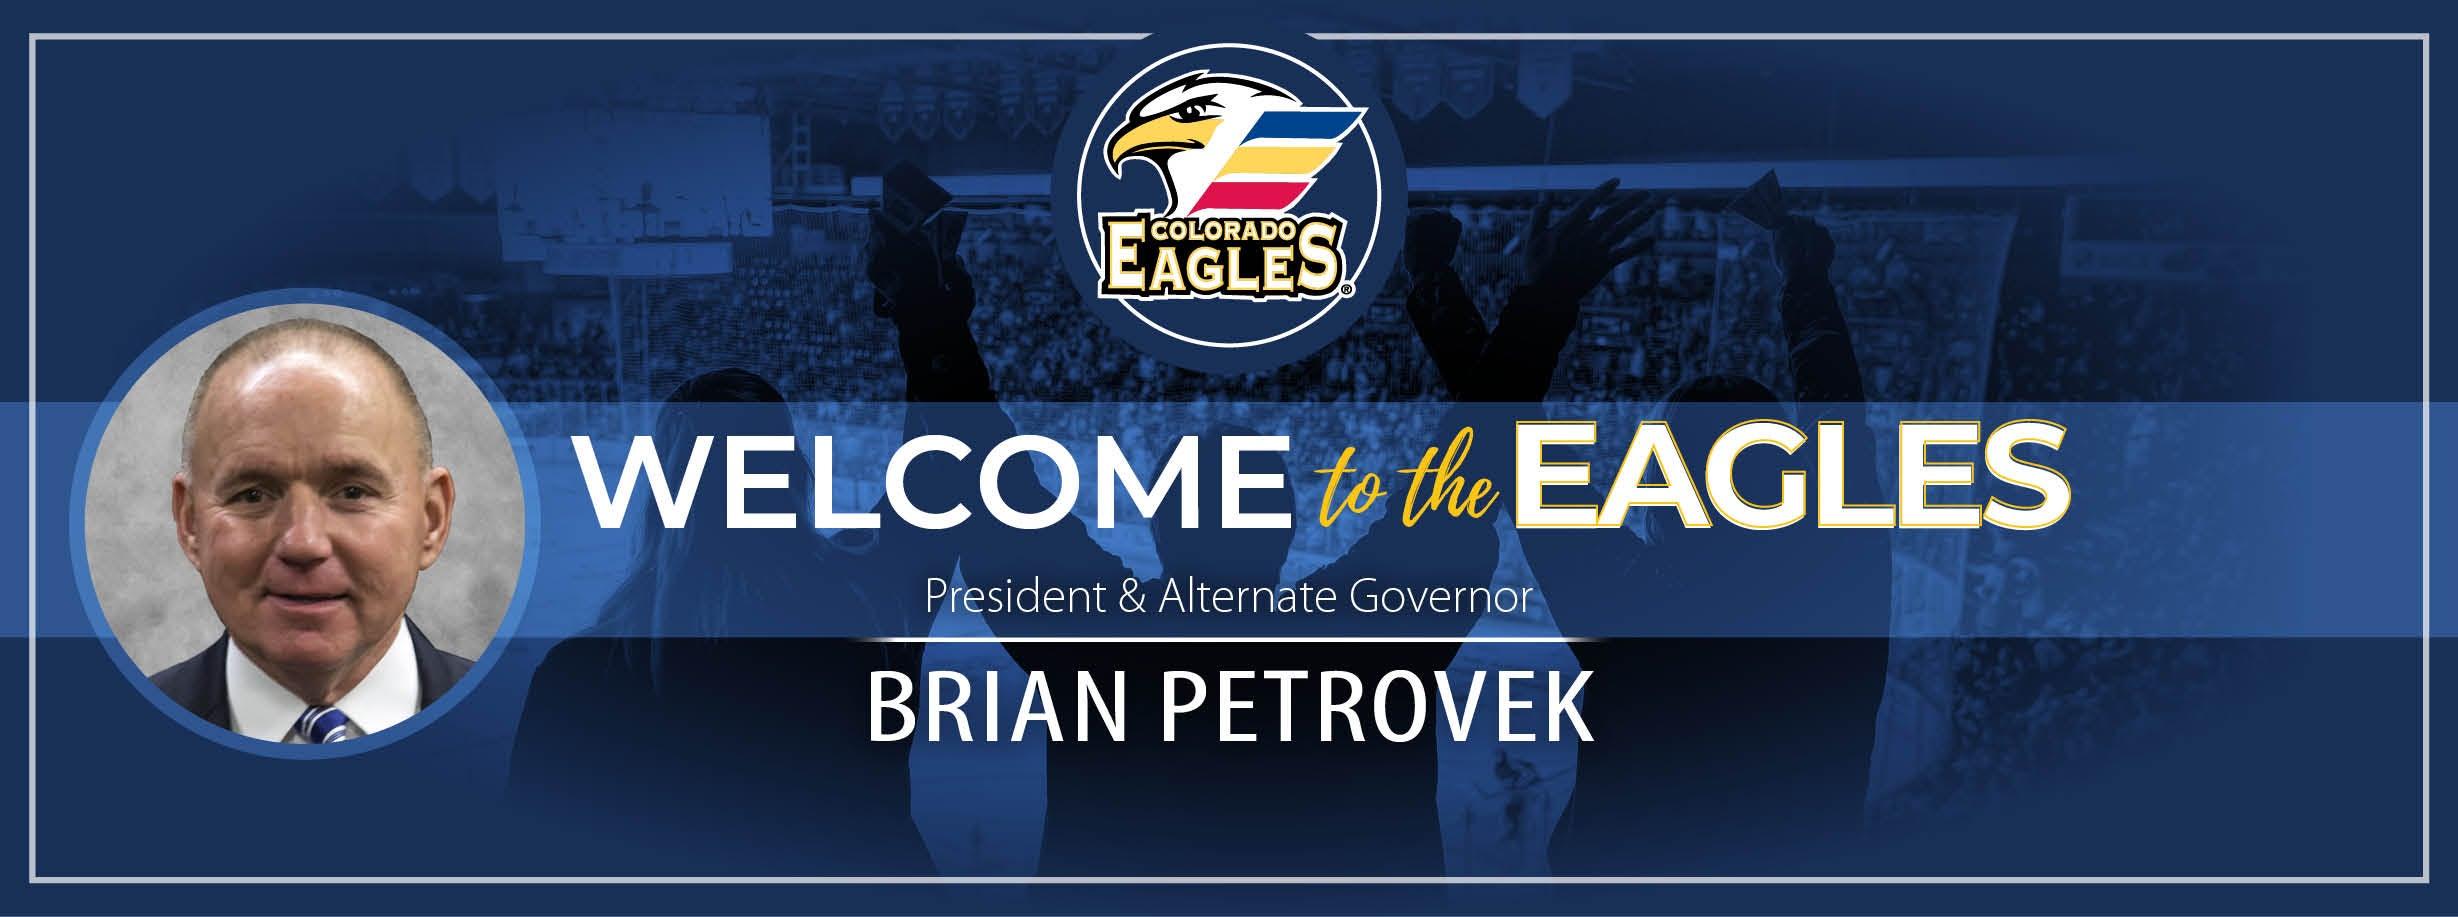 Brian Petrovek Named President and Alternate Governor